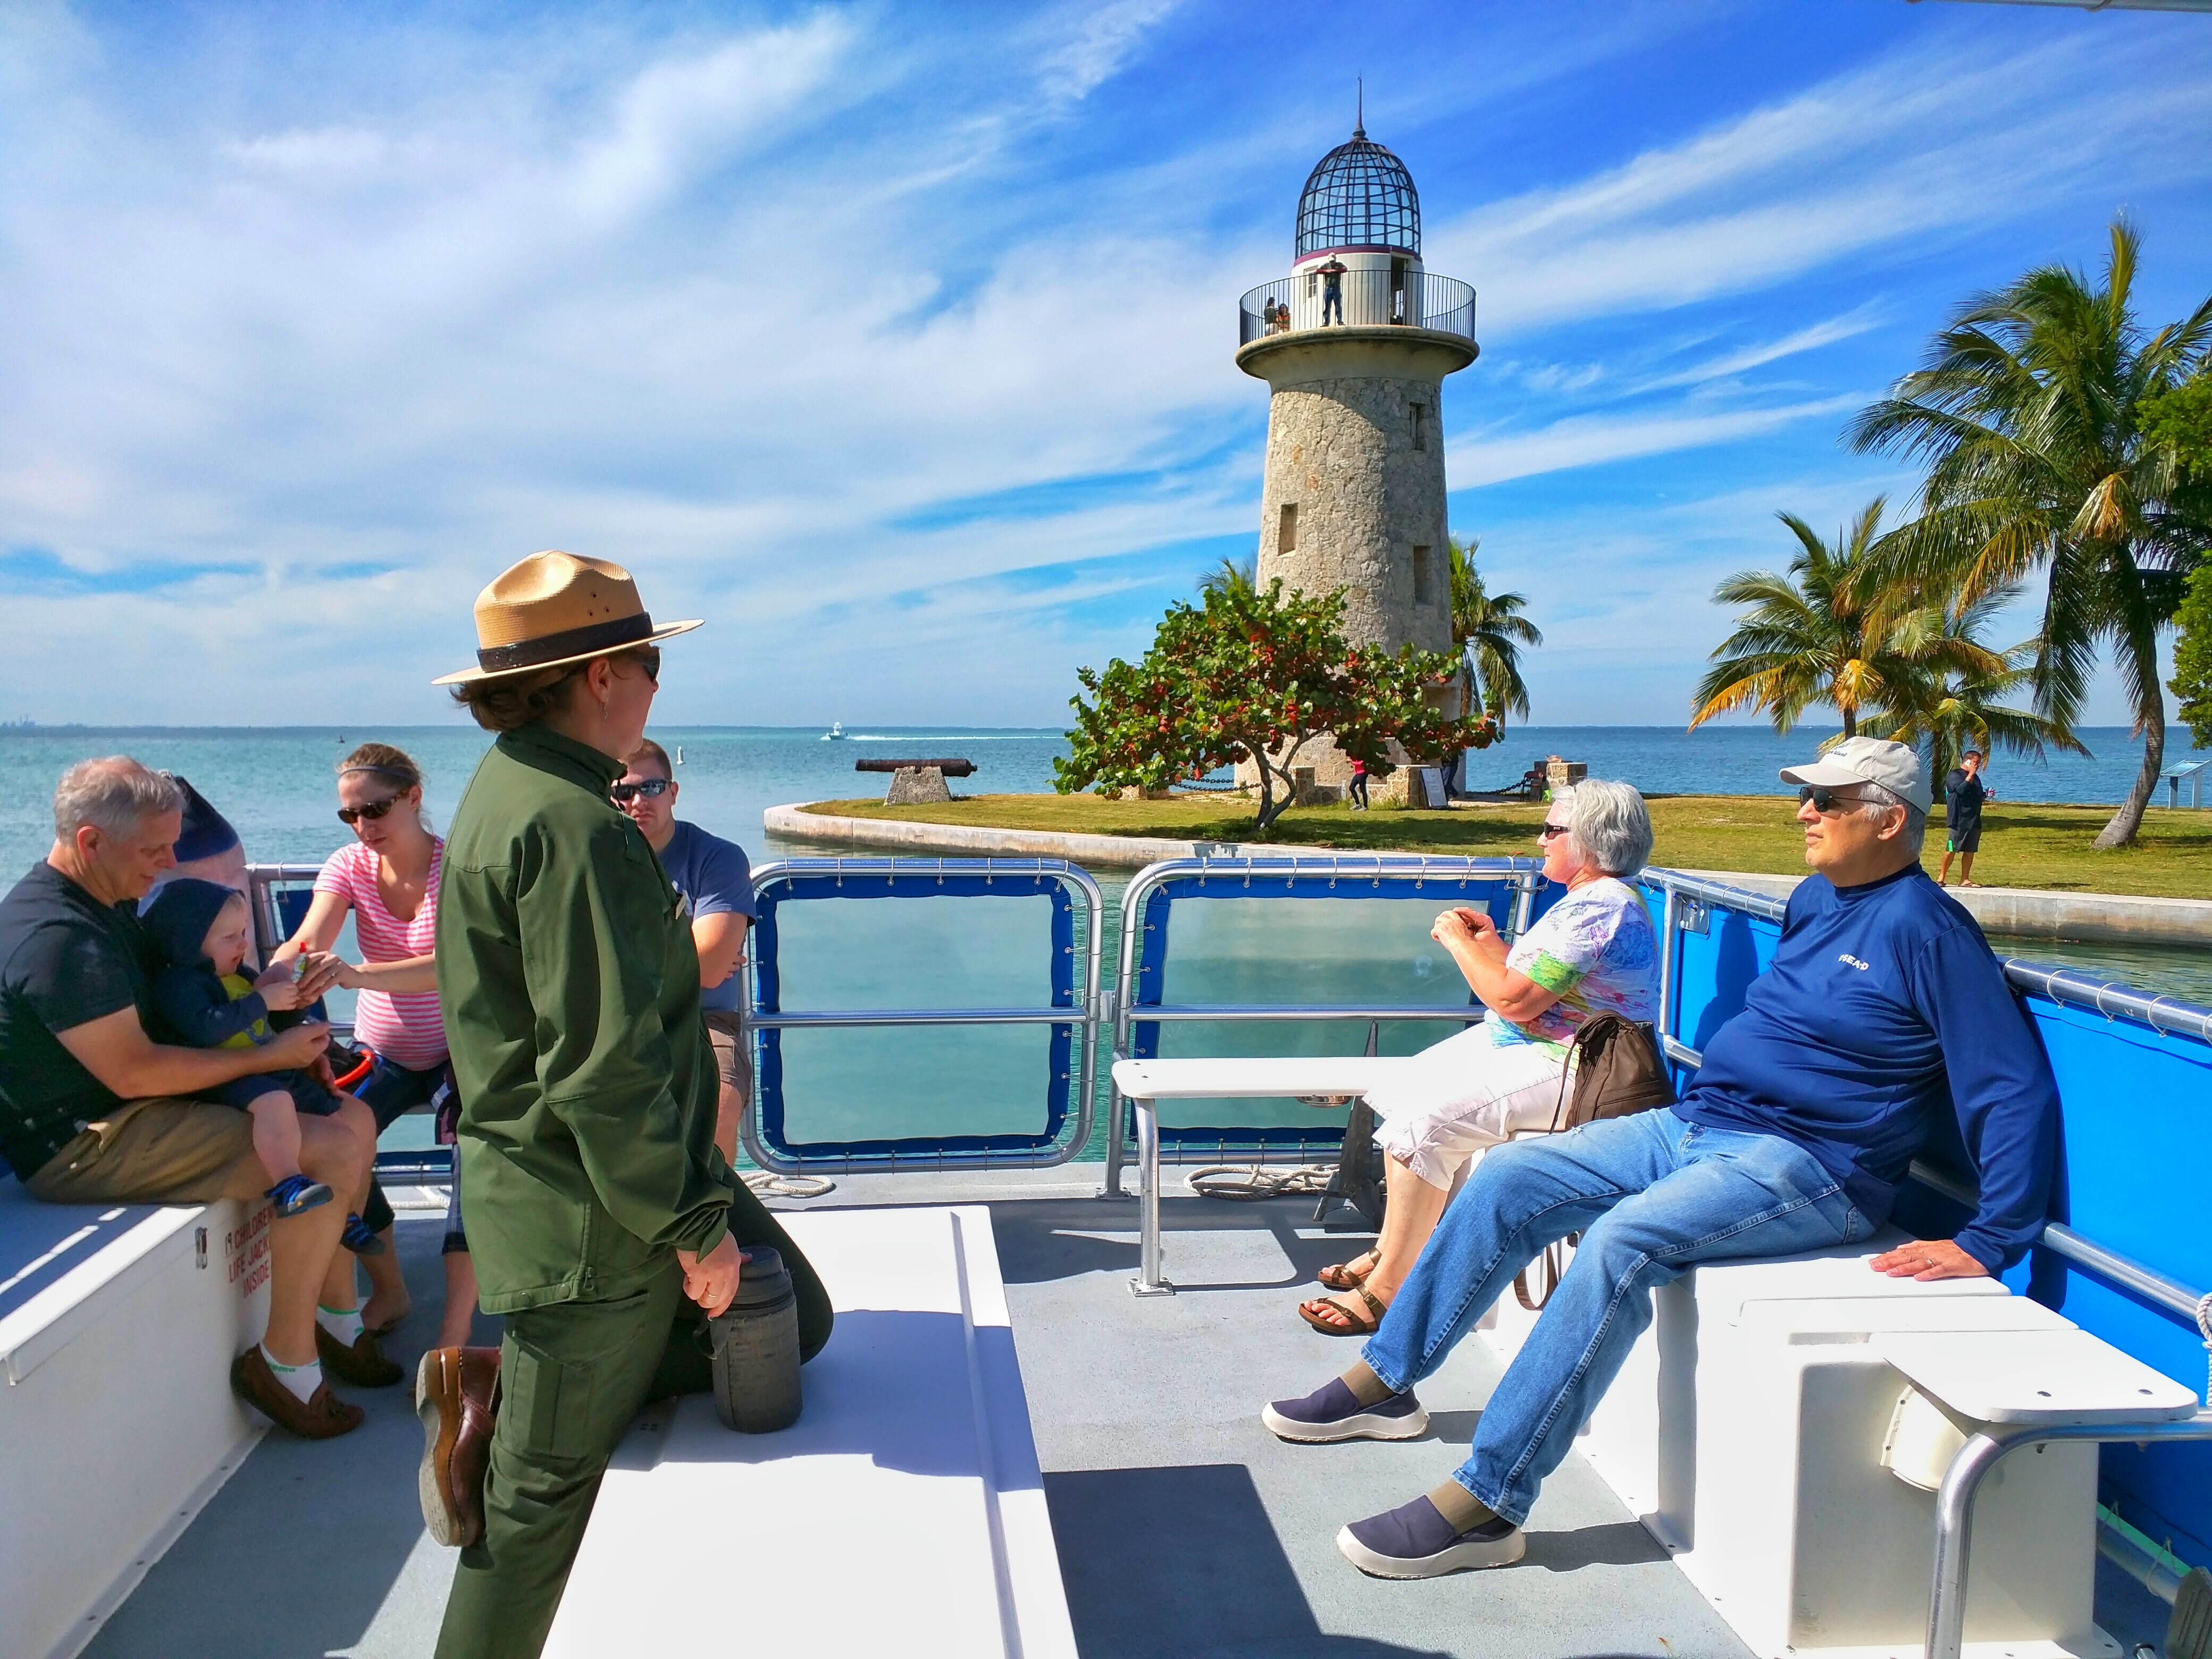 Excursie: Biscayne Bay Boat Tour in Miami, Florida |Boat Trip Miami Key Biscayne